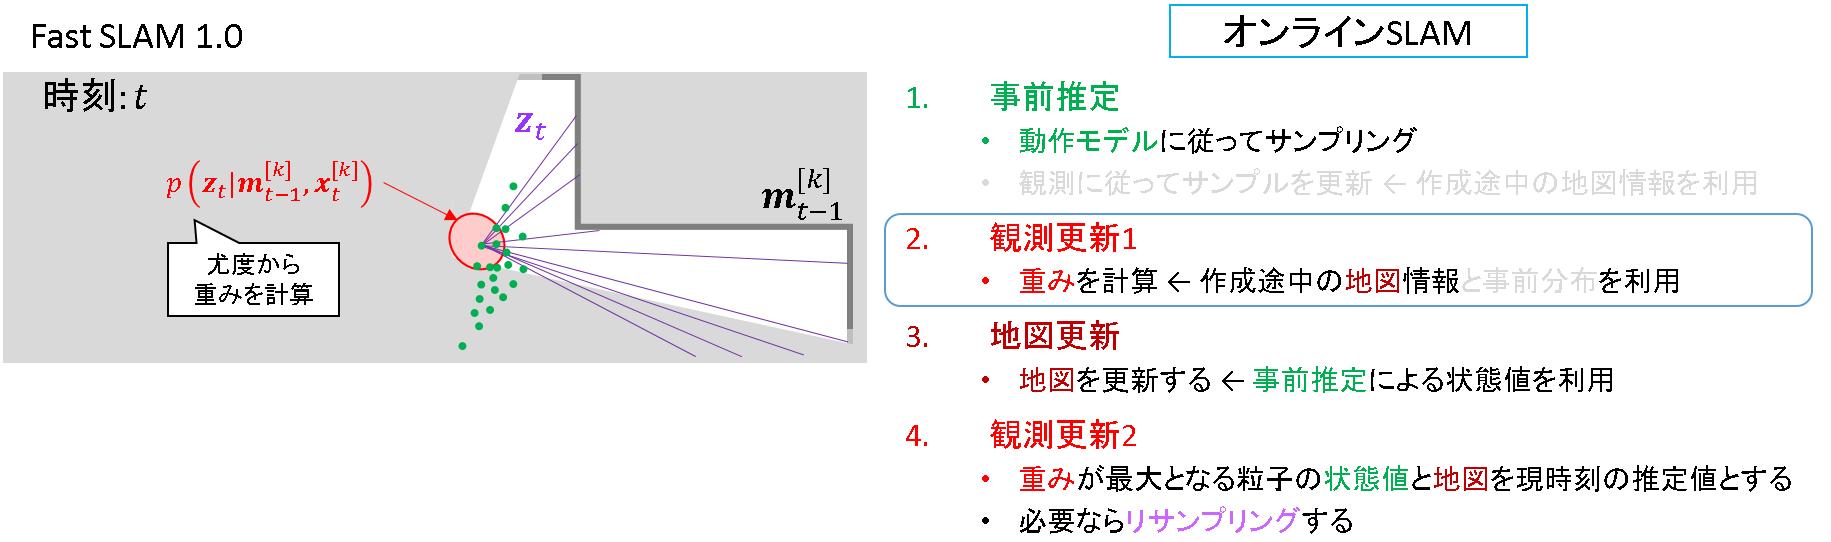 73_FastSLAM1.0_観測更新1.png